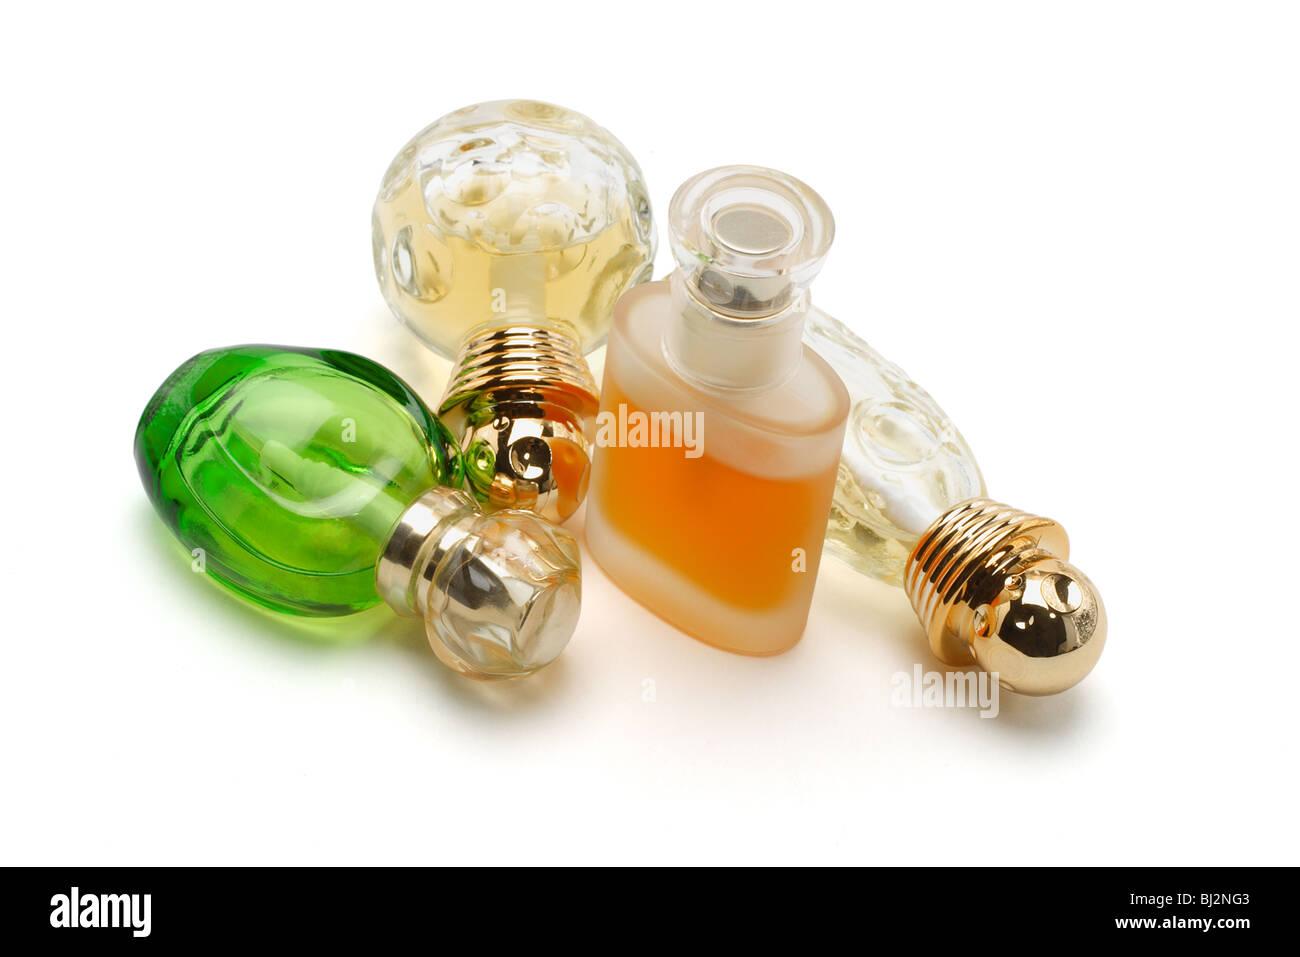 Perfume in glass bottles on white background Stock Photo